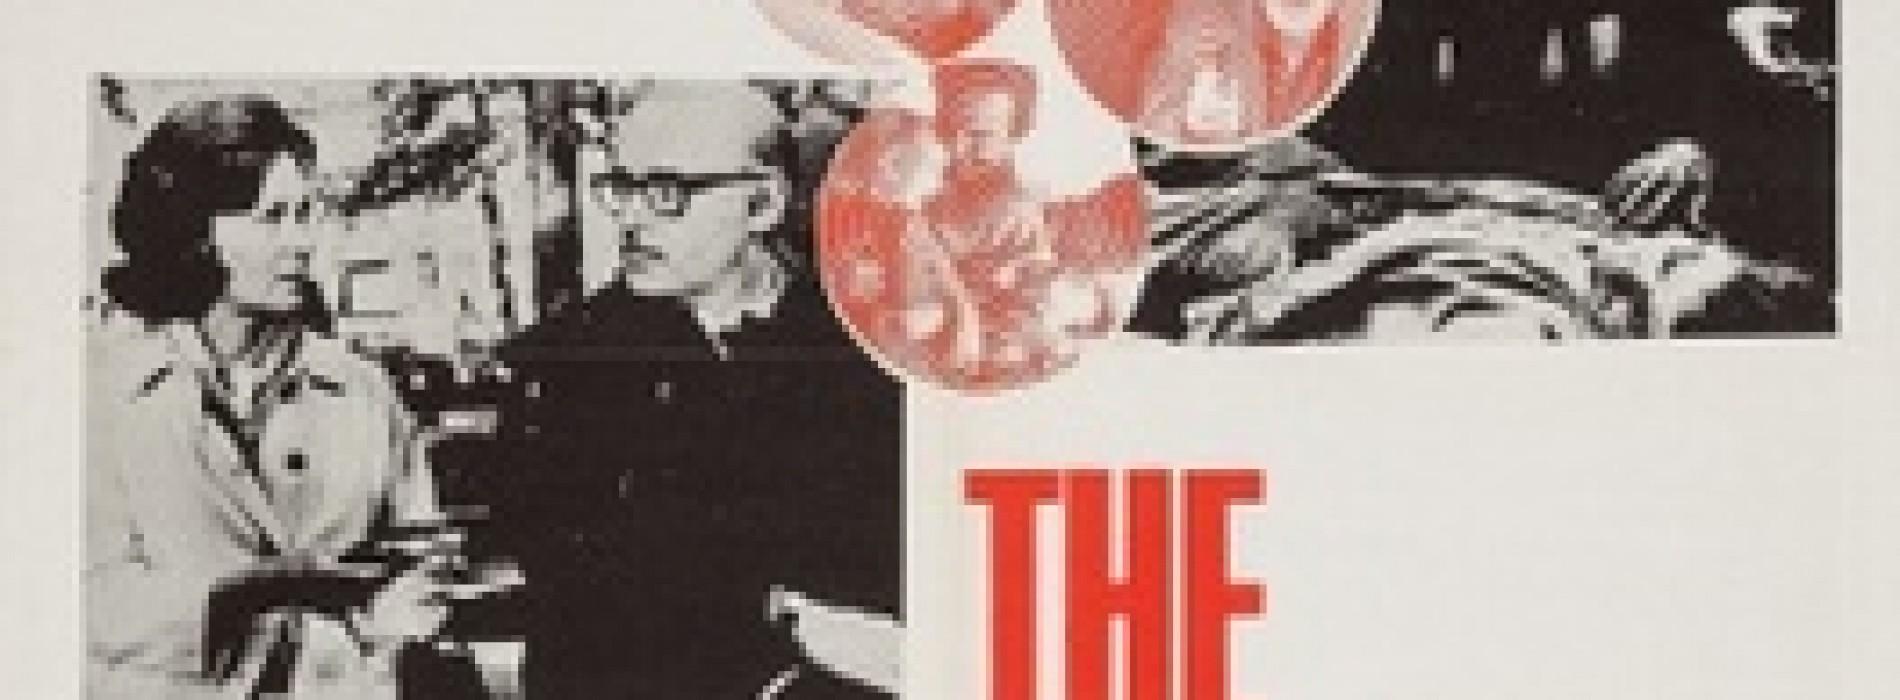 Cinema: The Pawnbroker (1965)